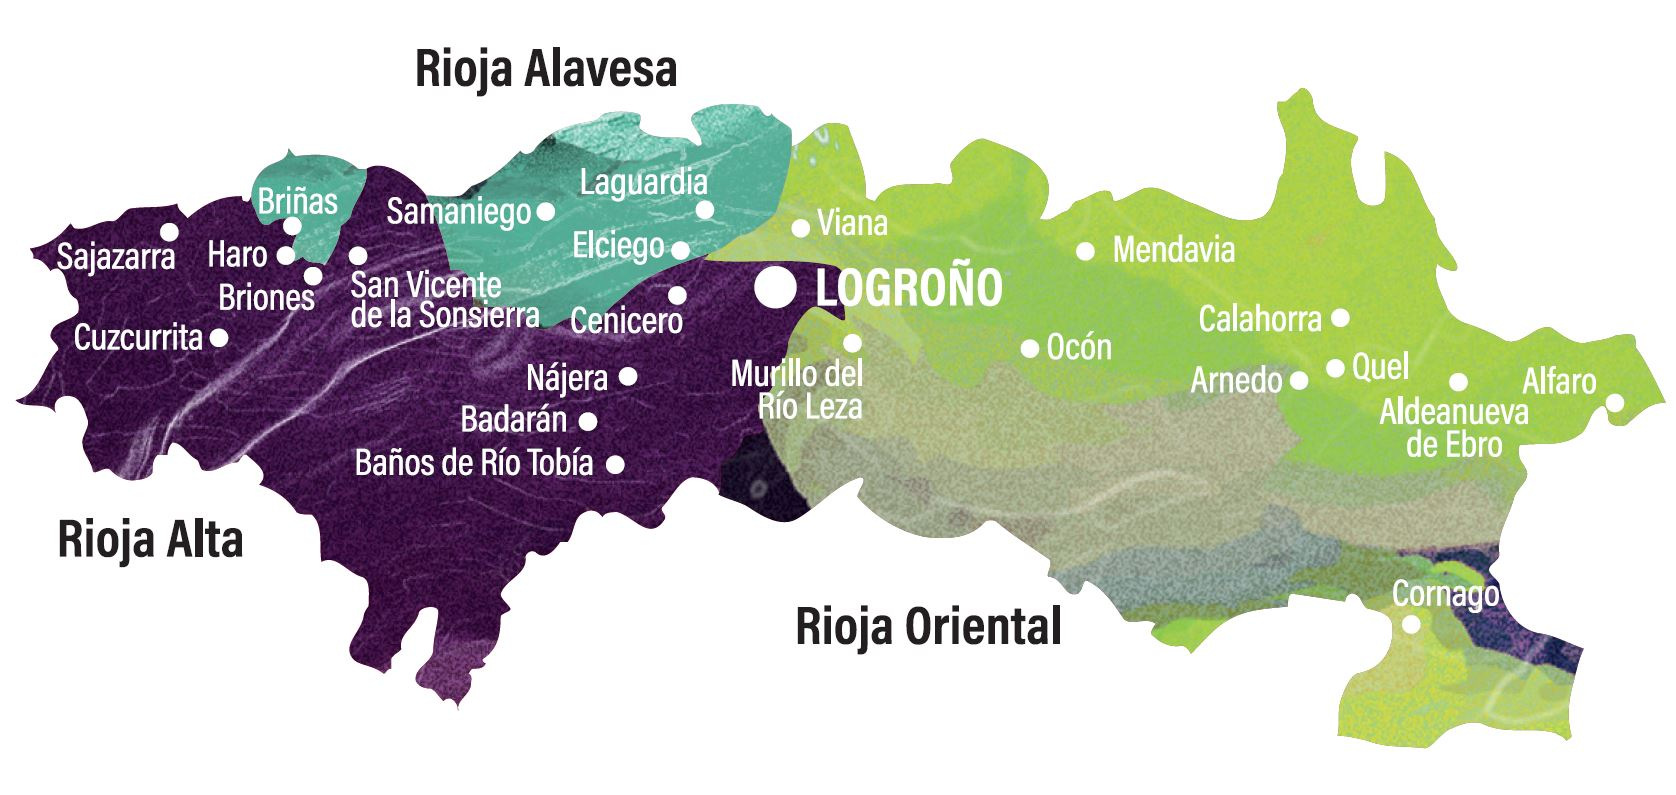 Wines Of Rioja - Rioja Region Map